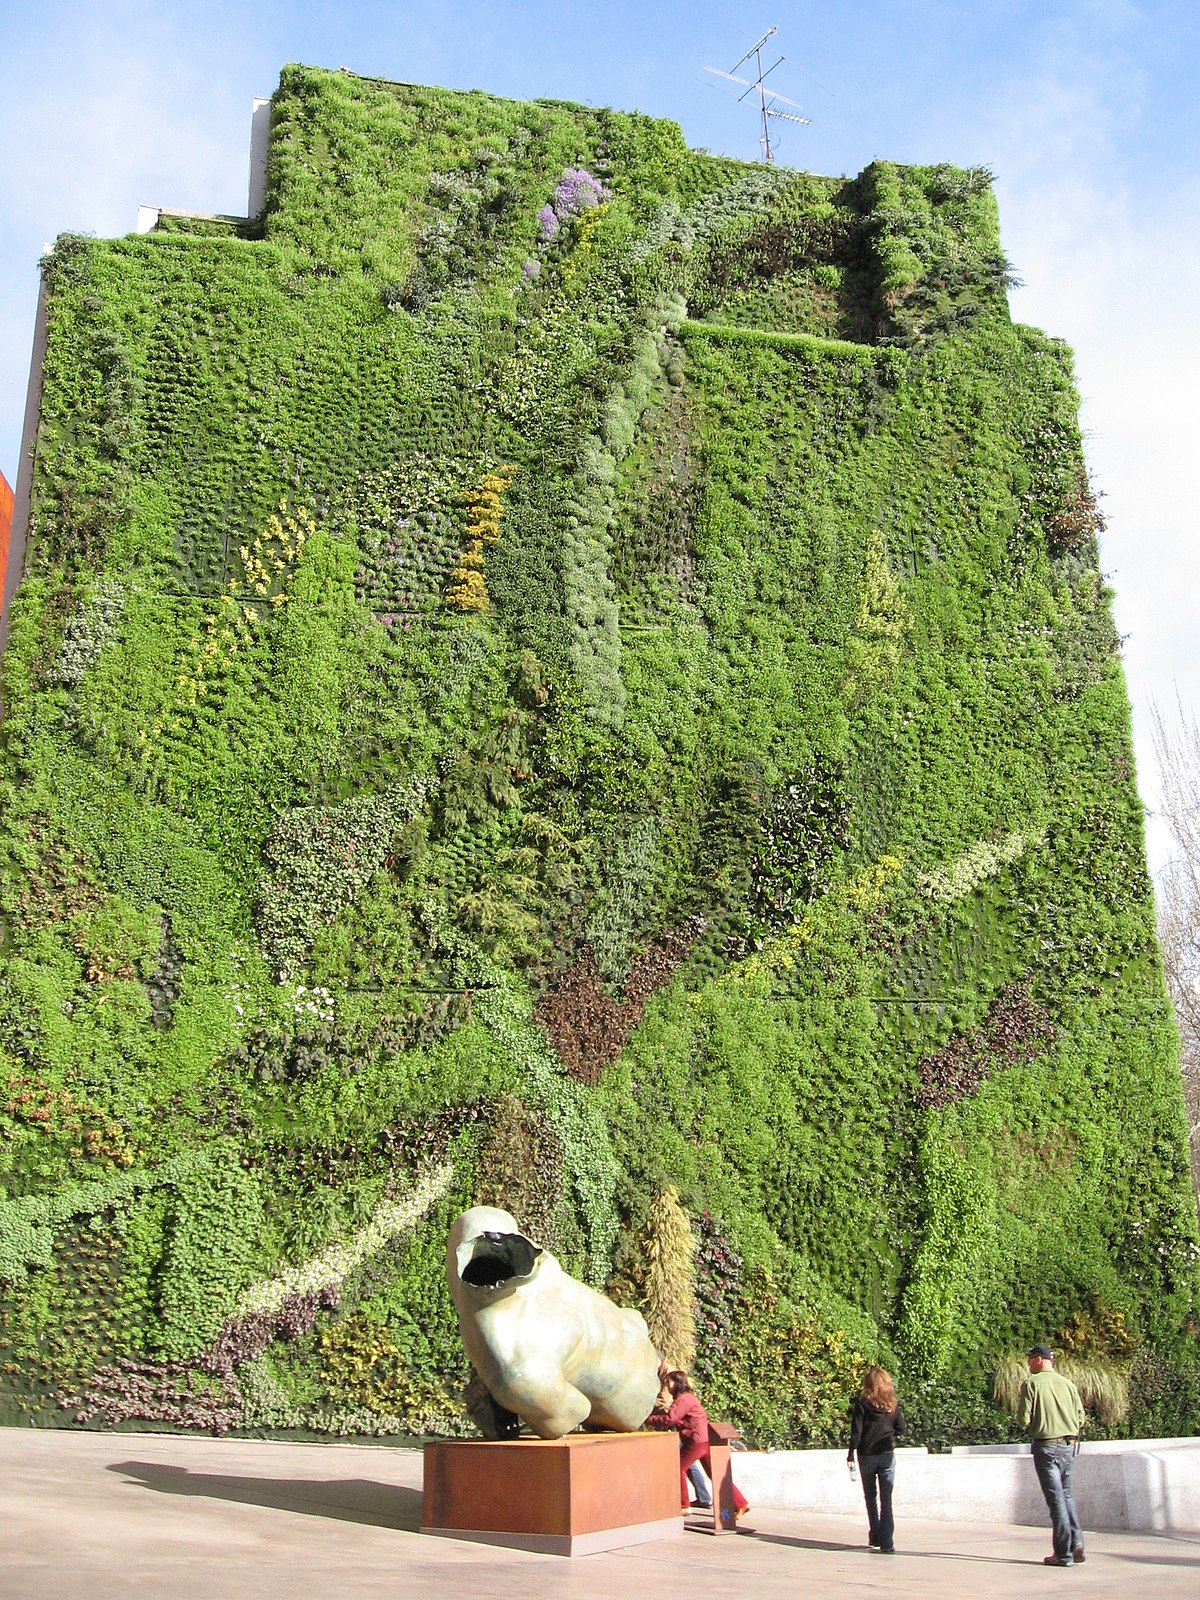 Giardino verticale wikipedia - Giardino verticale madrid ...